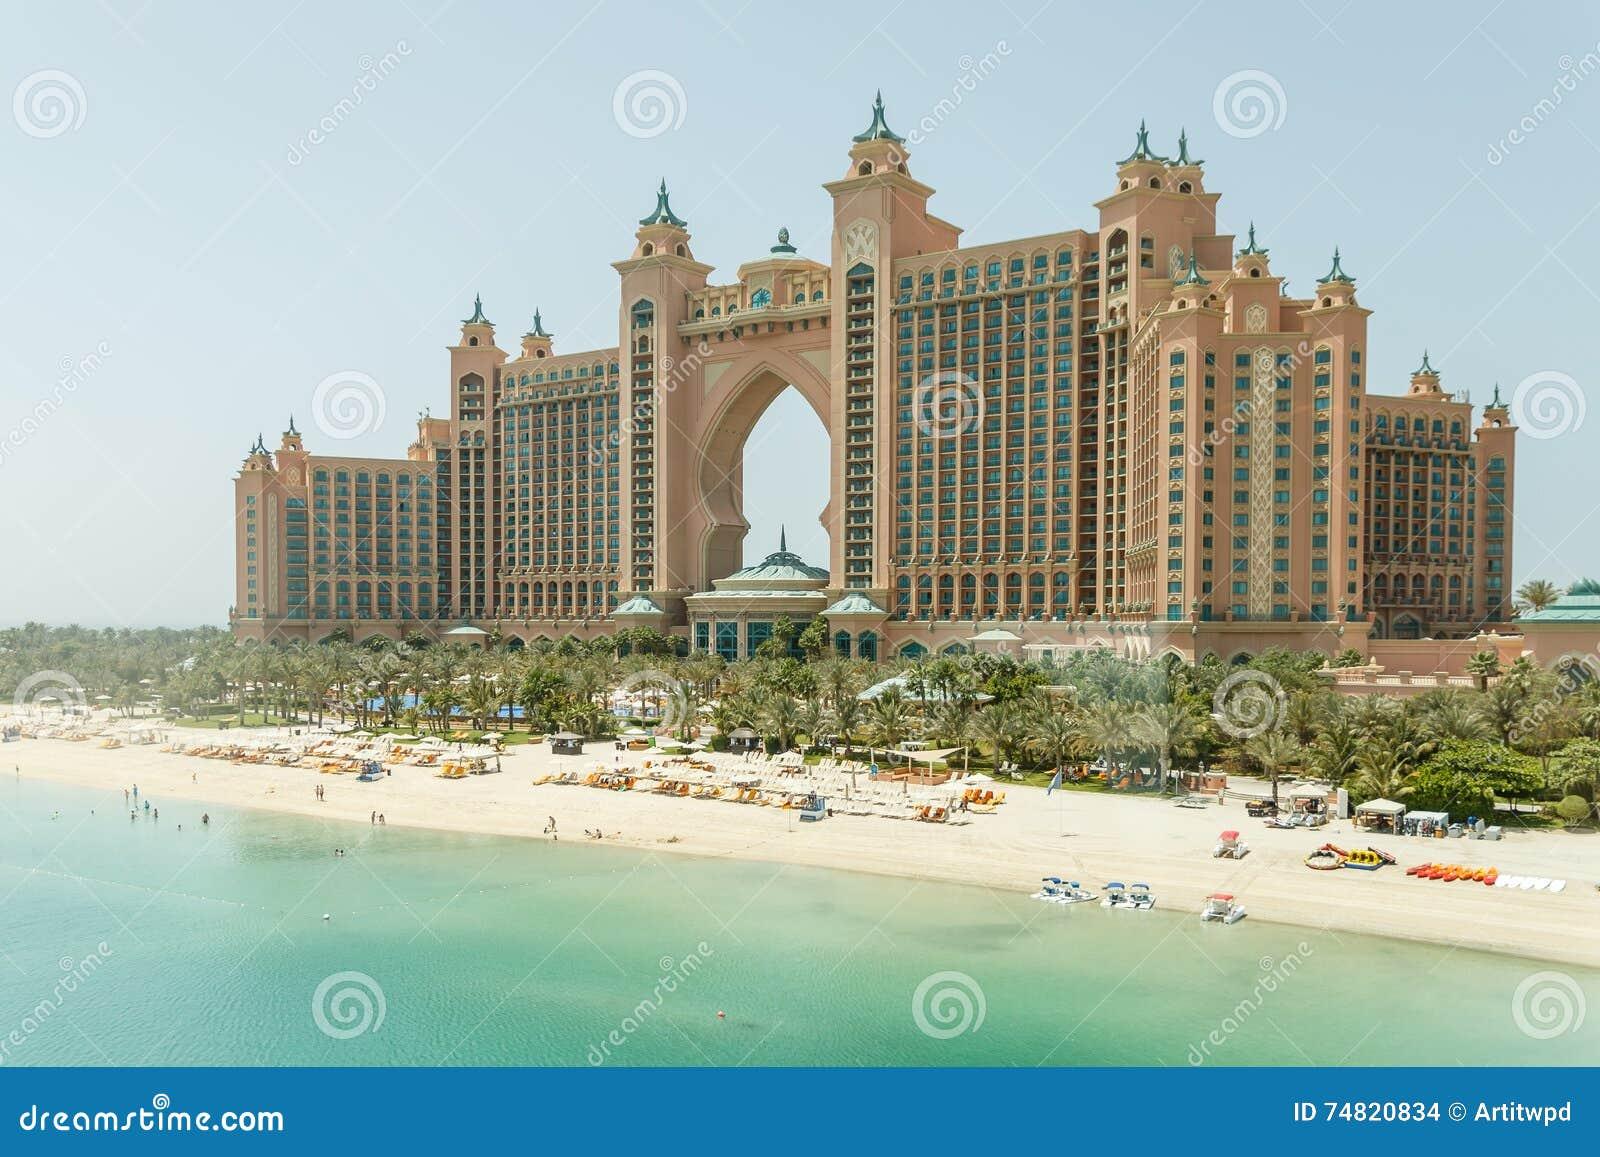 Atlantis the palm hotel the view from monorail dubai for Dubai palm hotel dubai